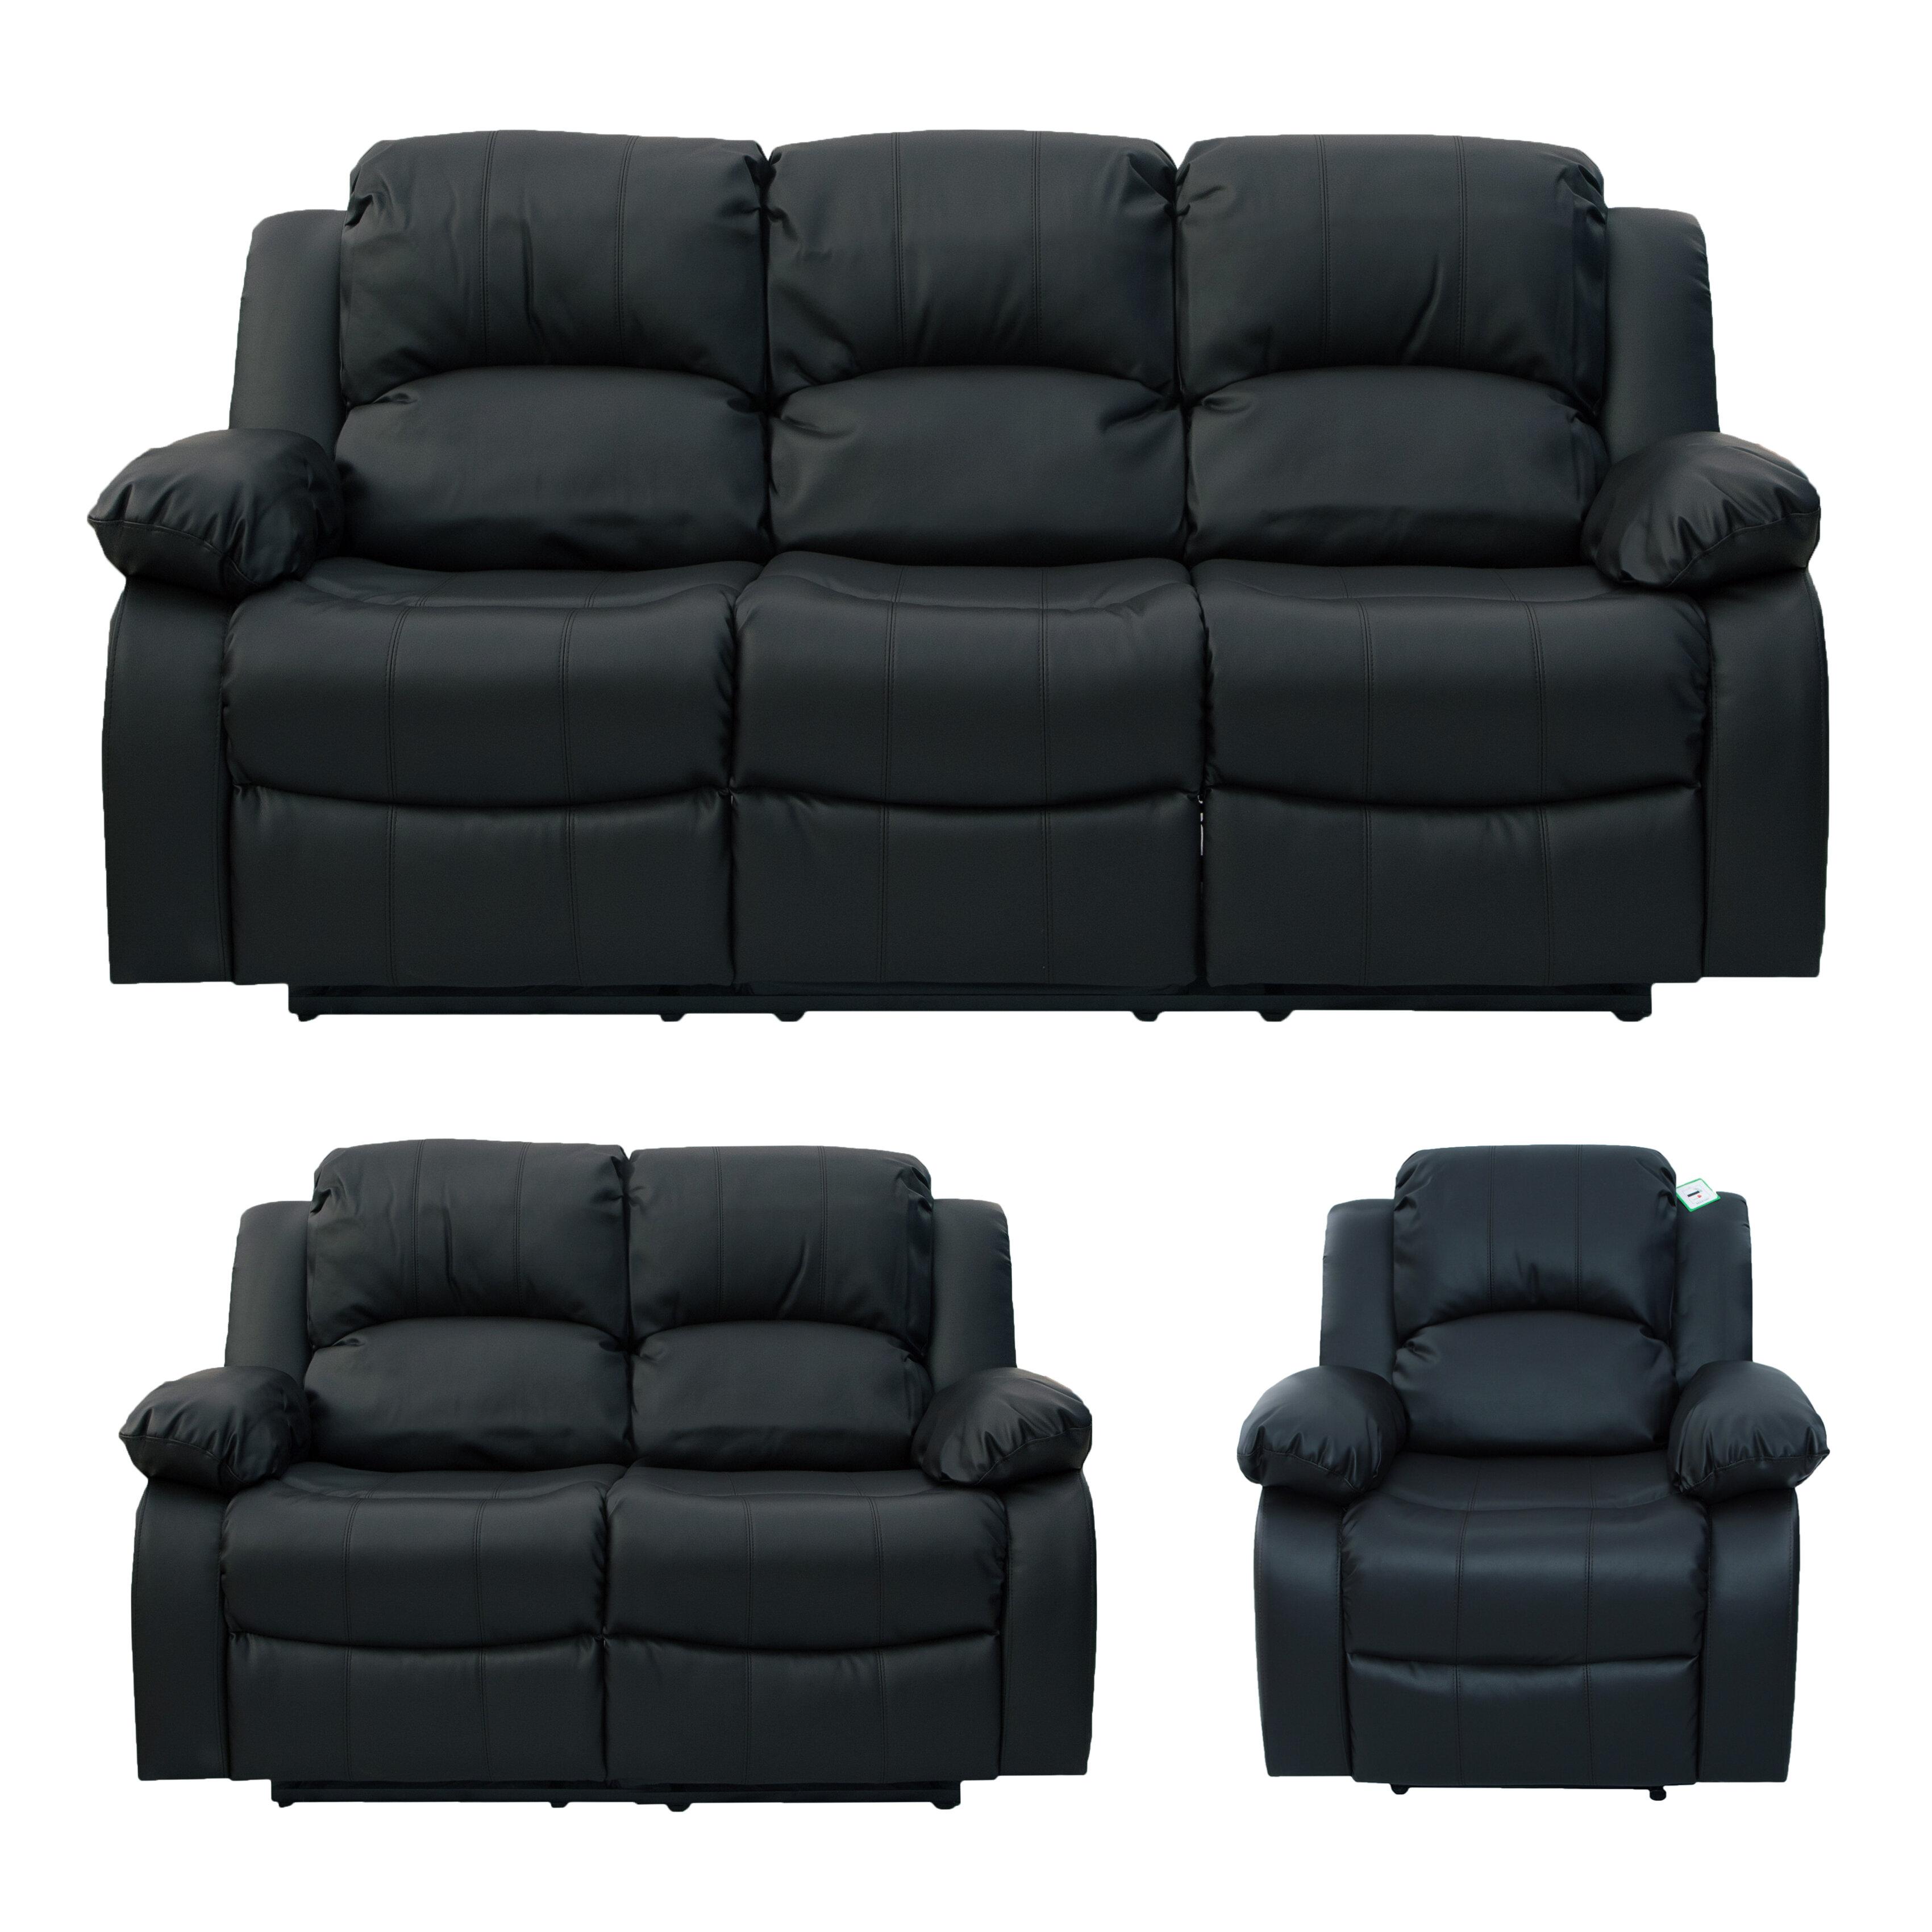 Kenworthy 3 Piece Reclining Sofa Set